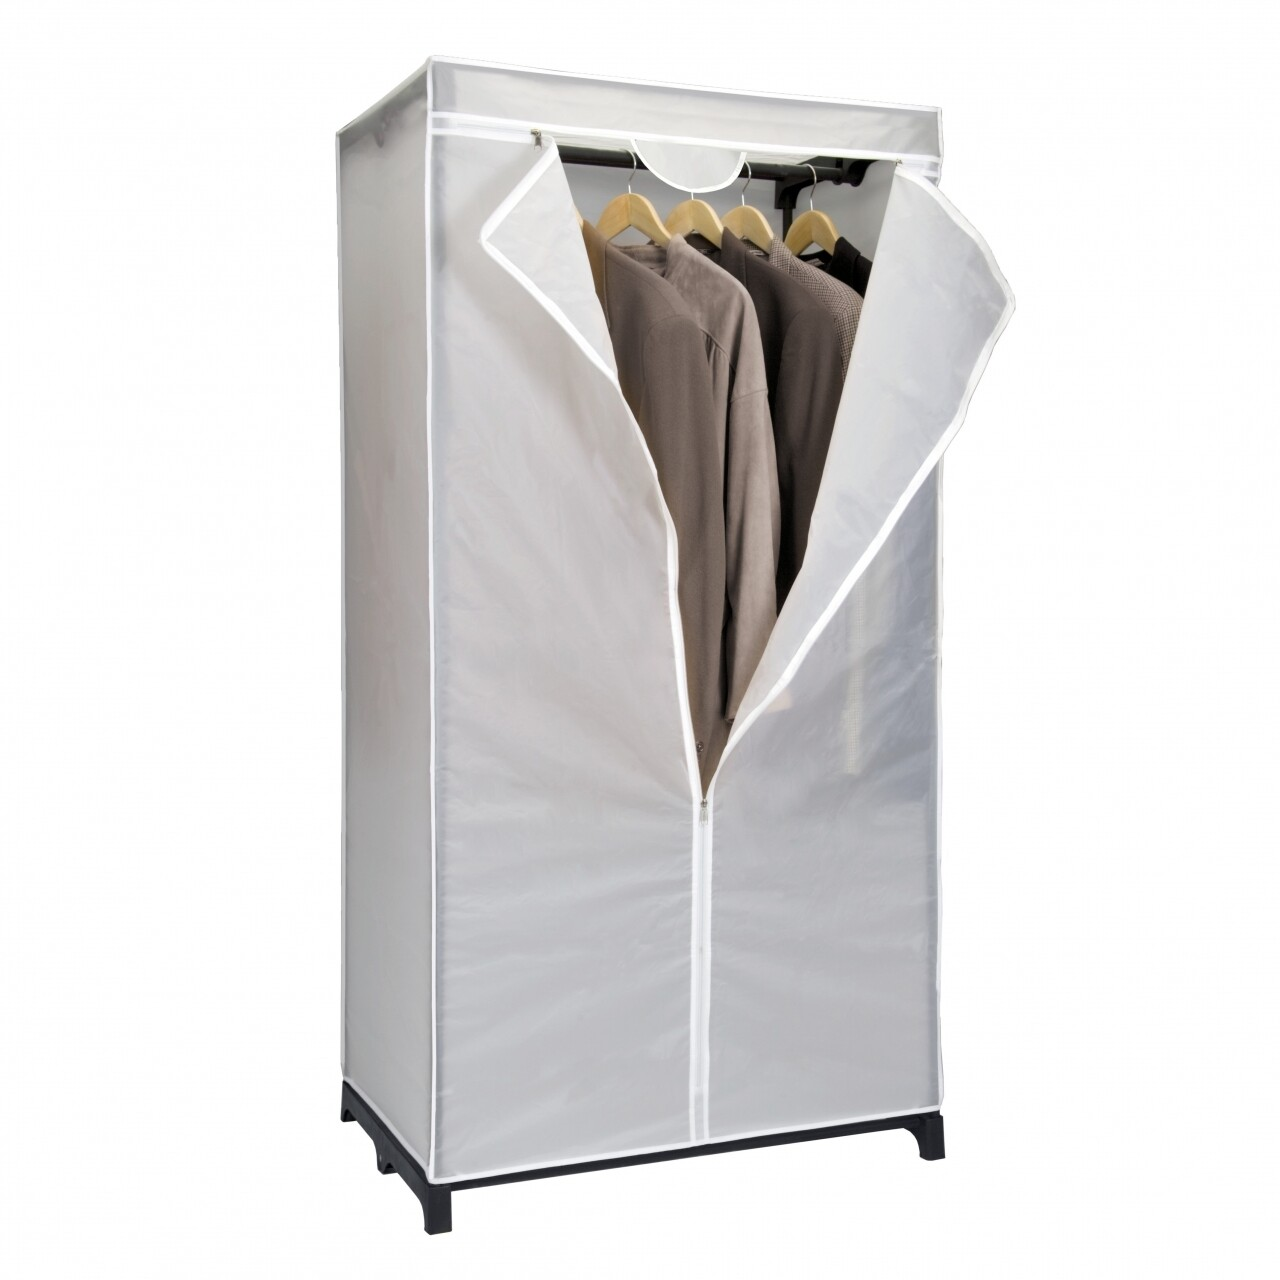 Dulap portabil pentru haine Polly, Metaltex, 75x50x150 cm, 100% PEVA, alb mat